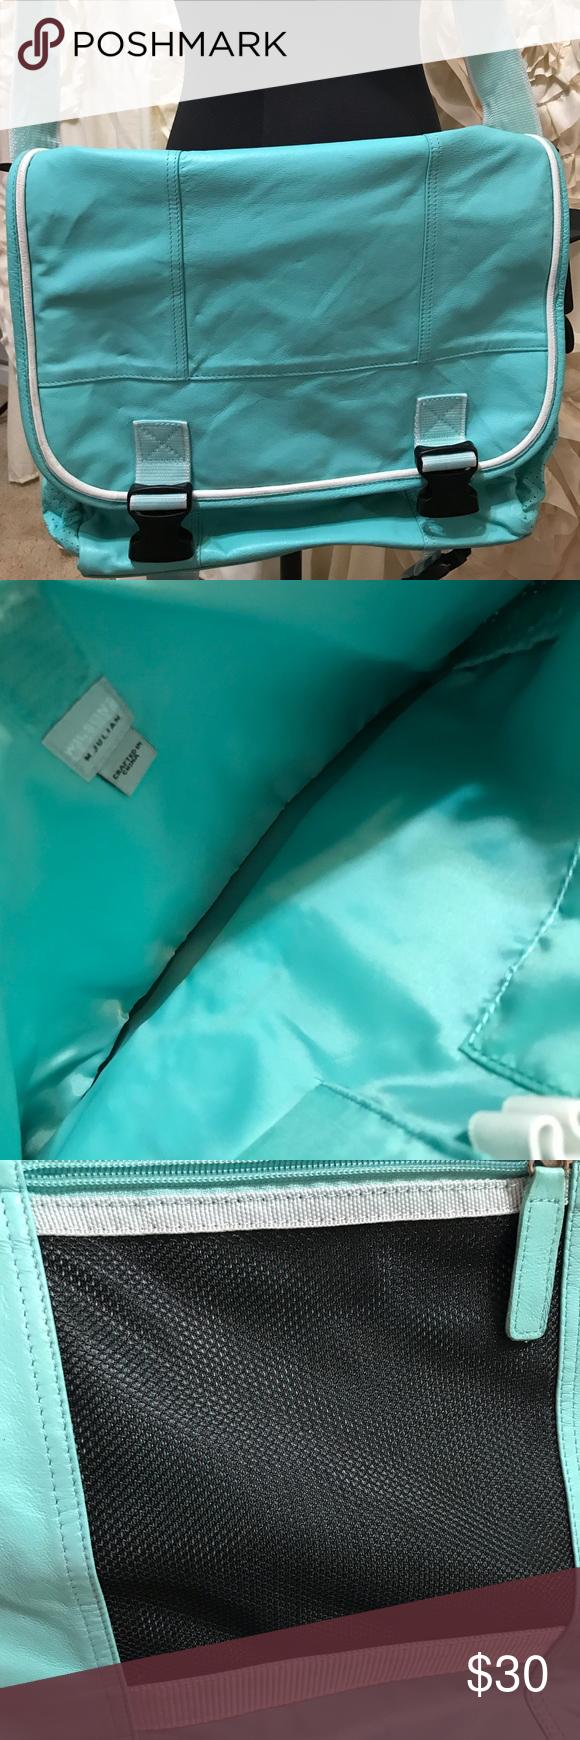 NWOT Wilson's Leather Bag 💼 16x11 Turquoise NWOT Wilson's